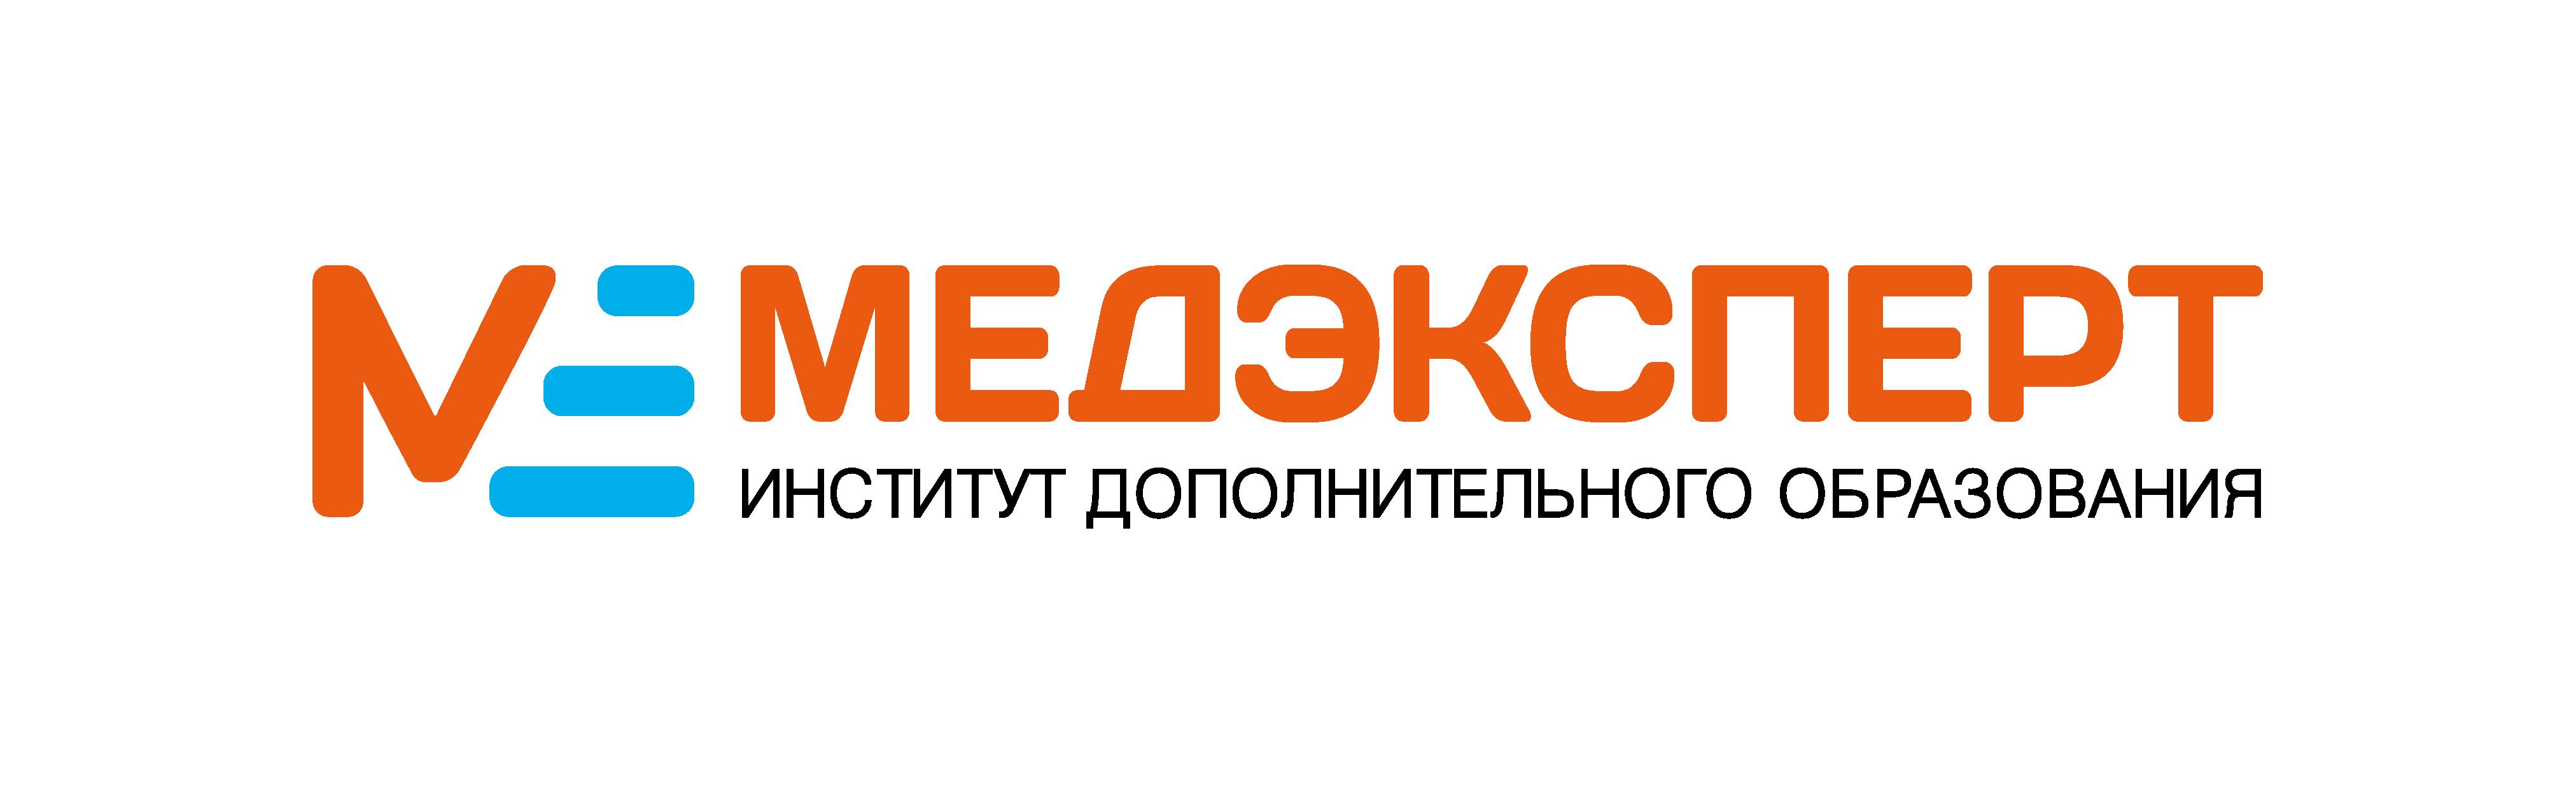 ИДО «Медэксперт»